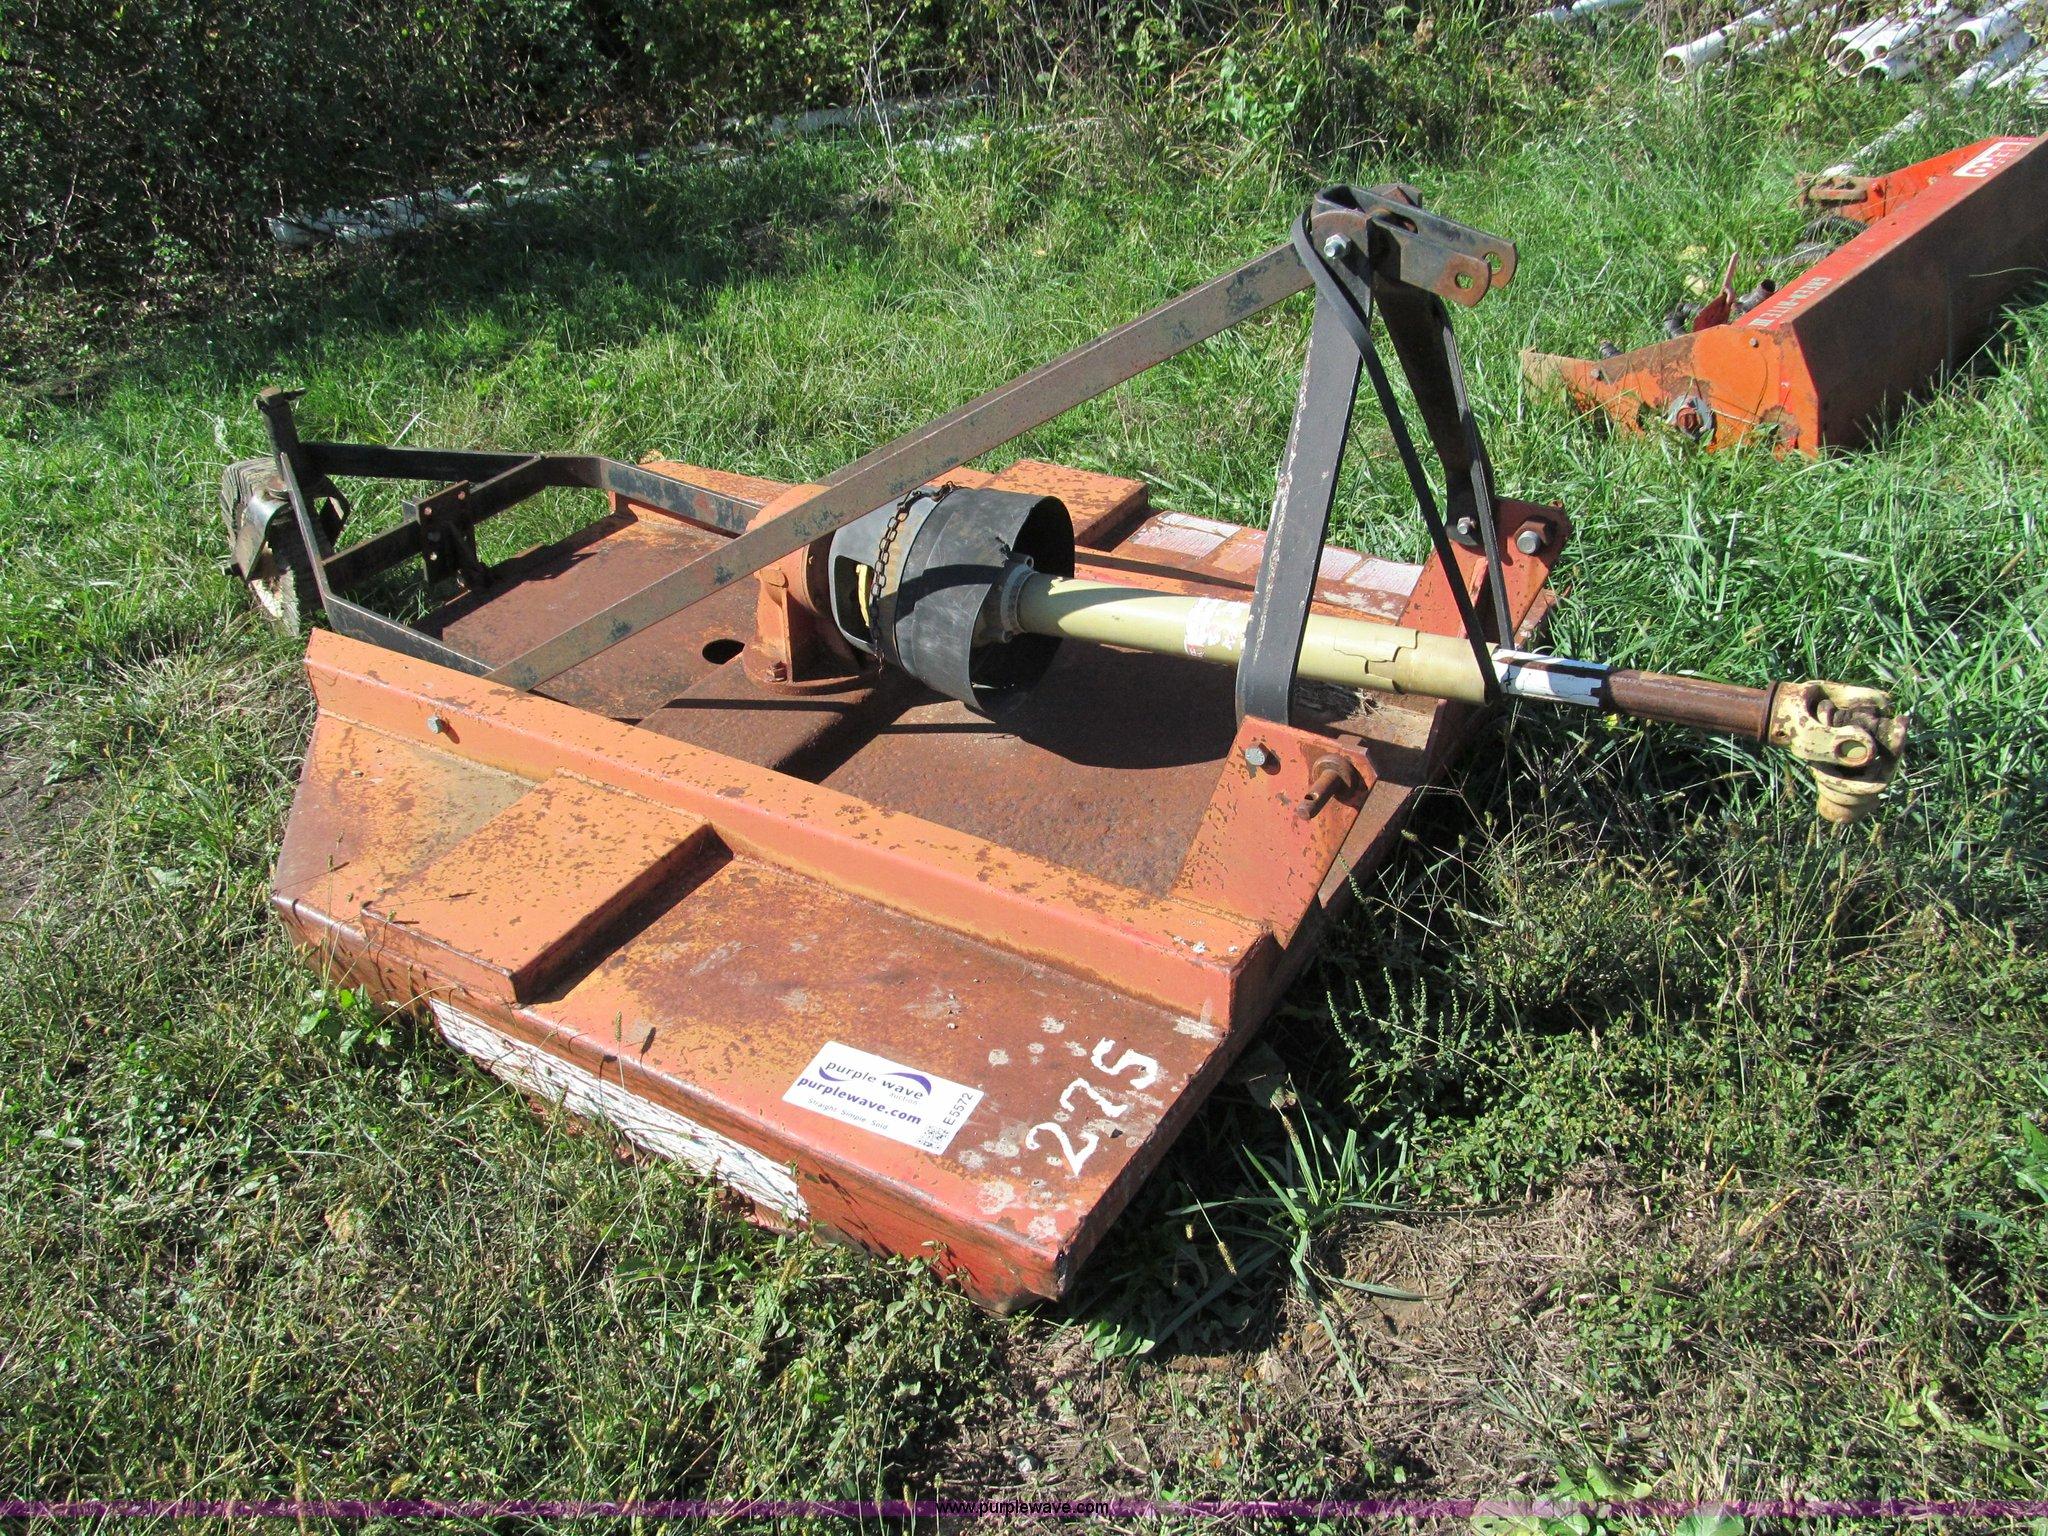 Brush Hog 275 5 Rotary Mower Item E5572 Sold Wednesday